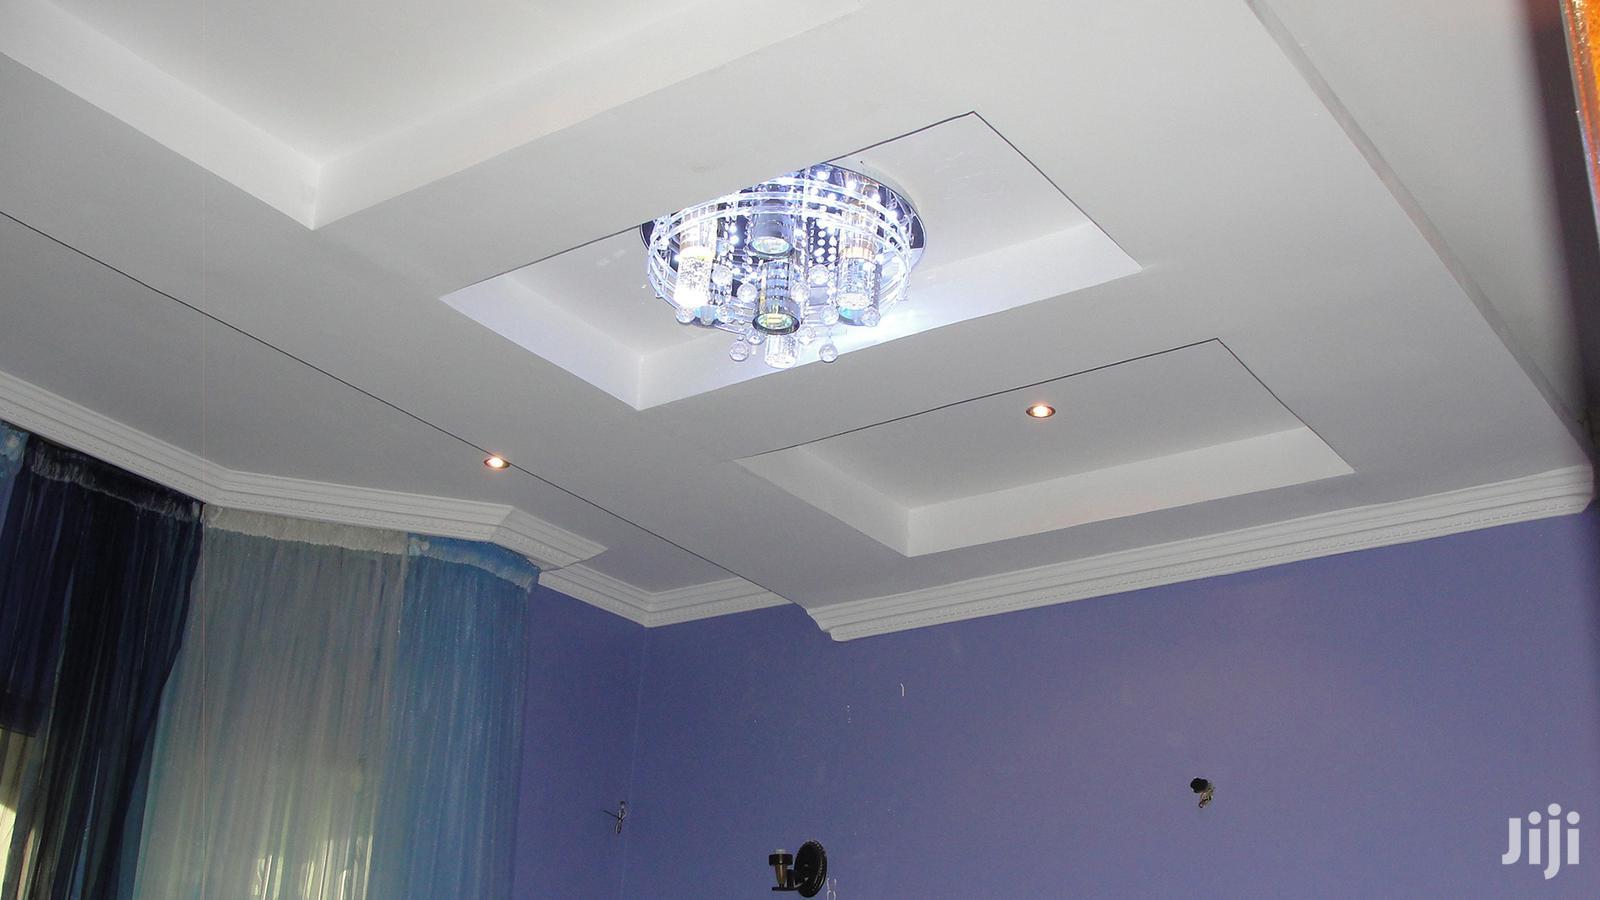 Gypsum Ceiling Designs Supply and Fix 3500/Sqm